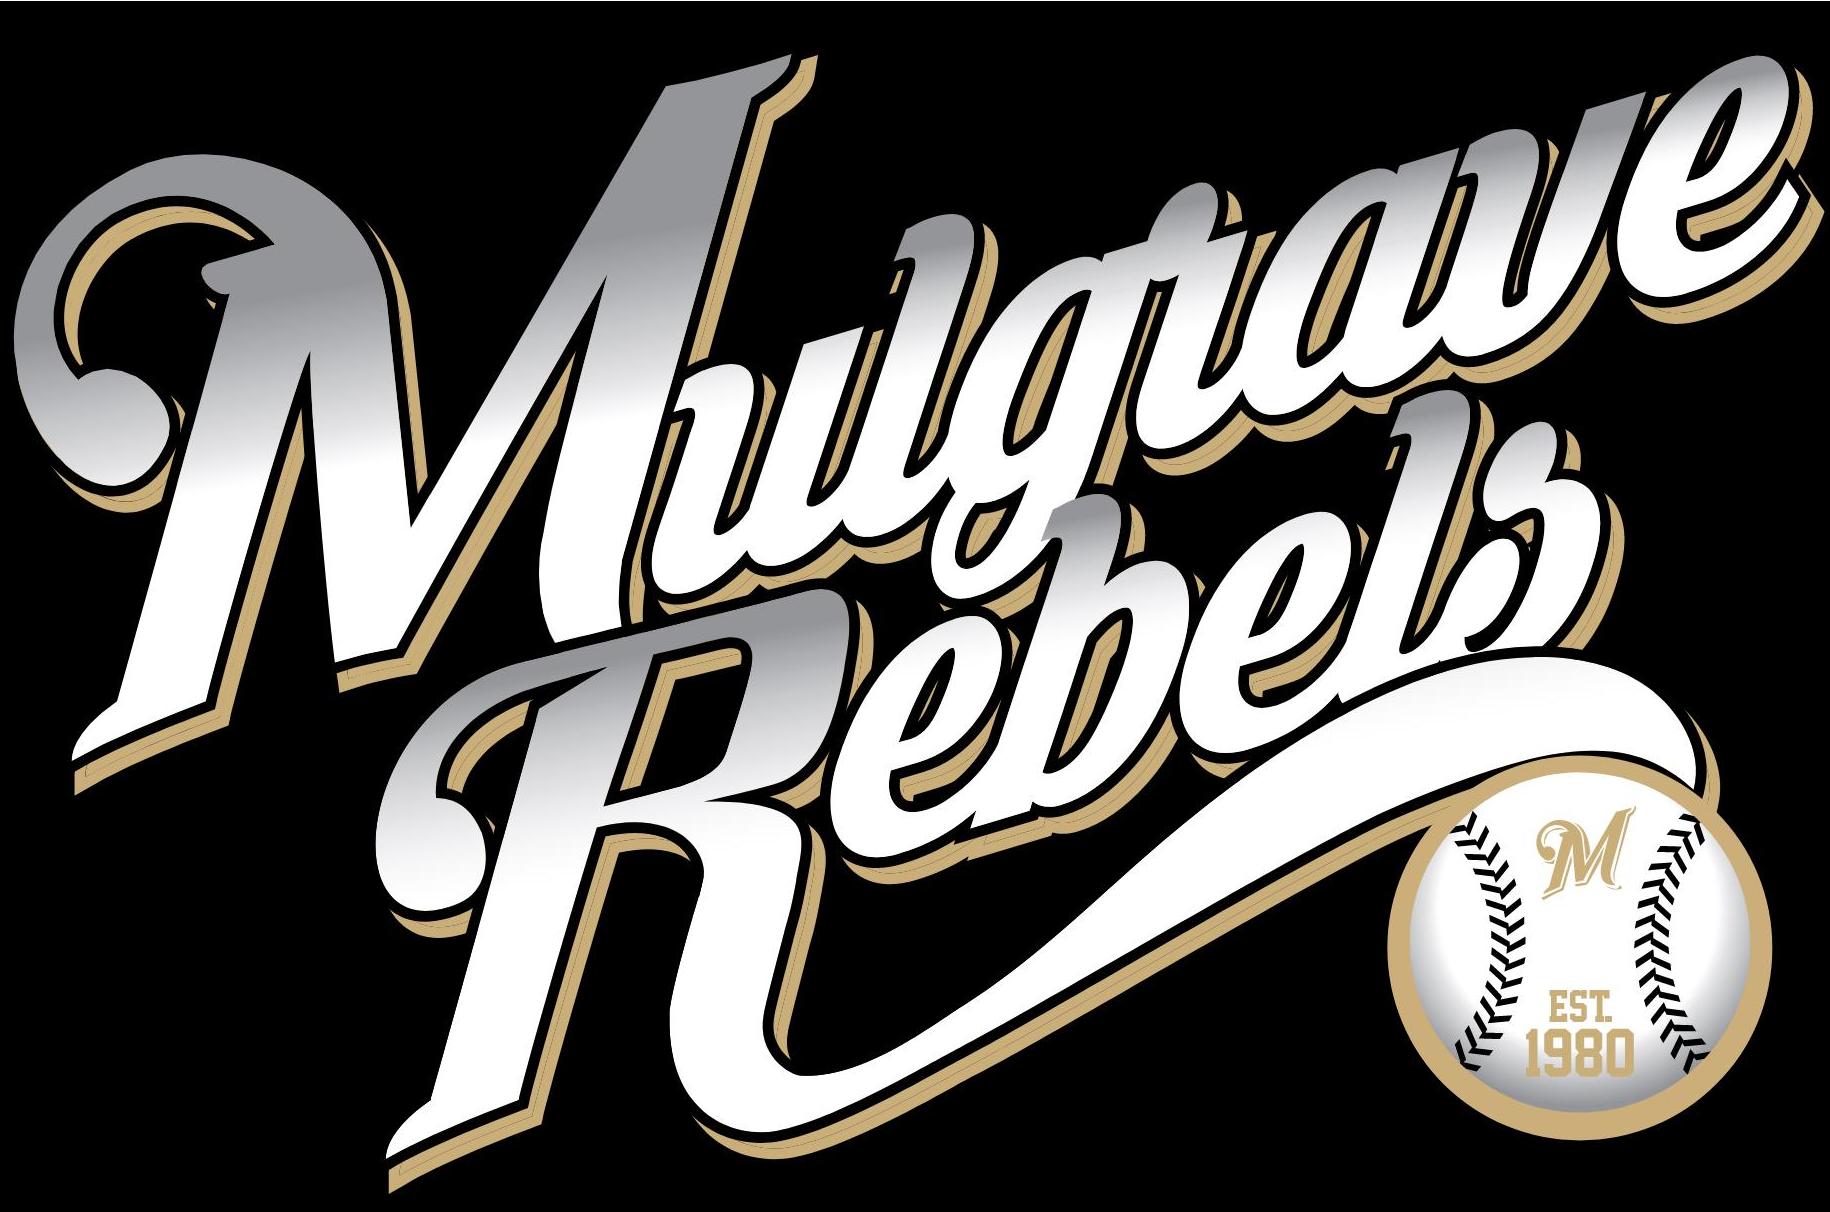 Mulgrave Rebels Baseball Club